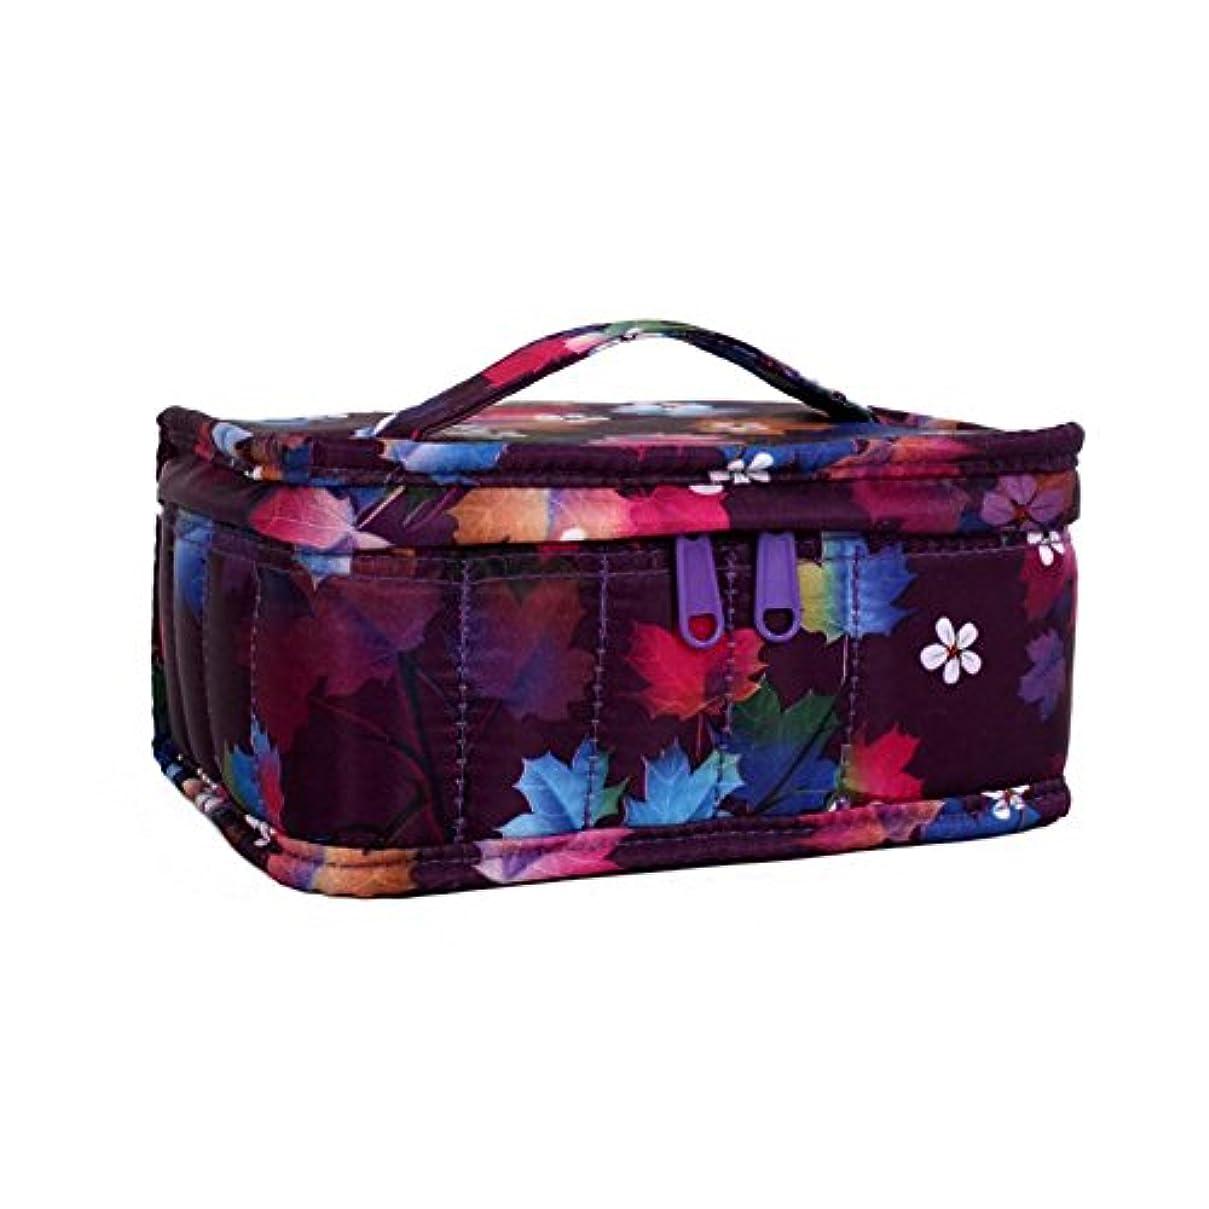 Farlong 色柄17コマオイルバッグ エッセンシャルオイル収納袋 香水収納袋 アロマオイル収納袋 保管袋 パッケージ携帯ケース用 大容量 4色